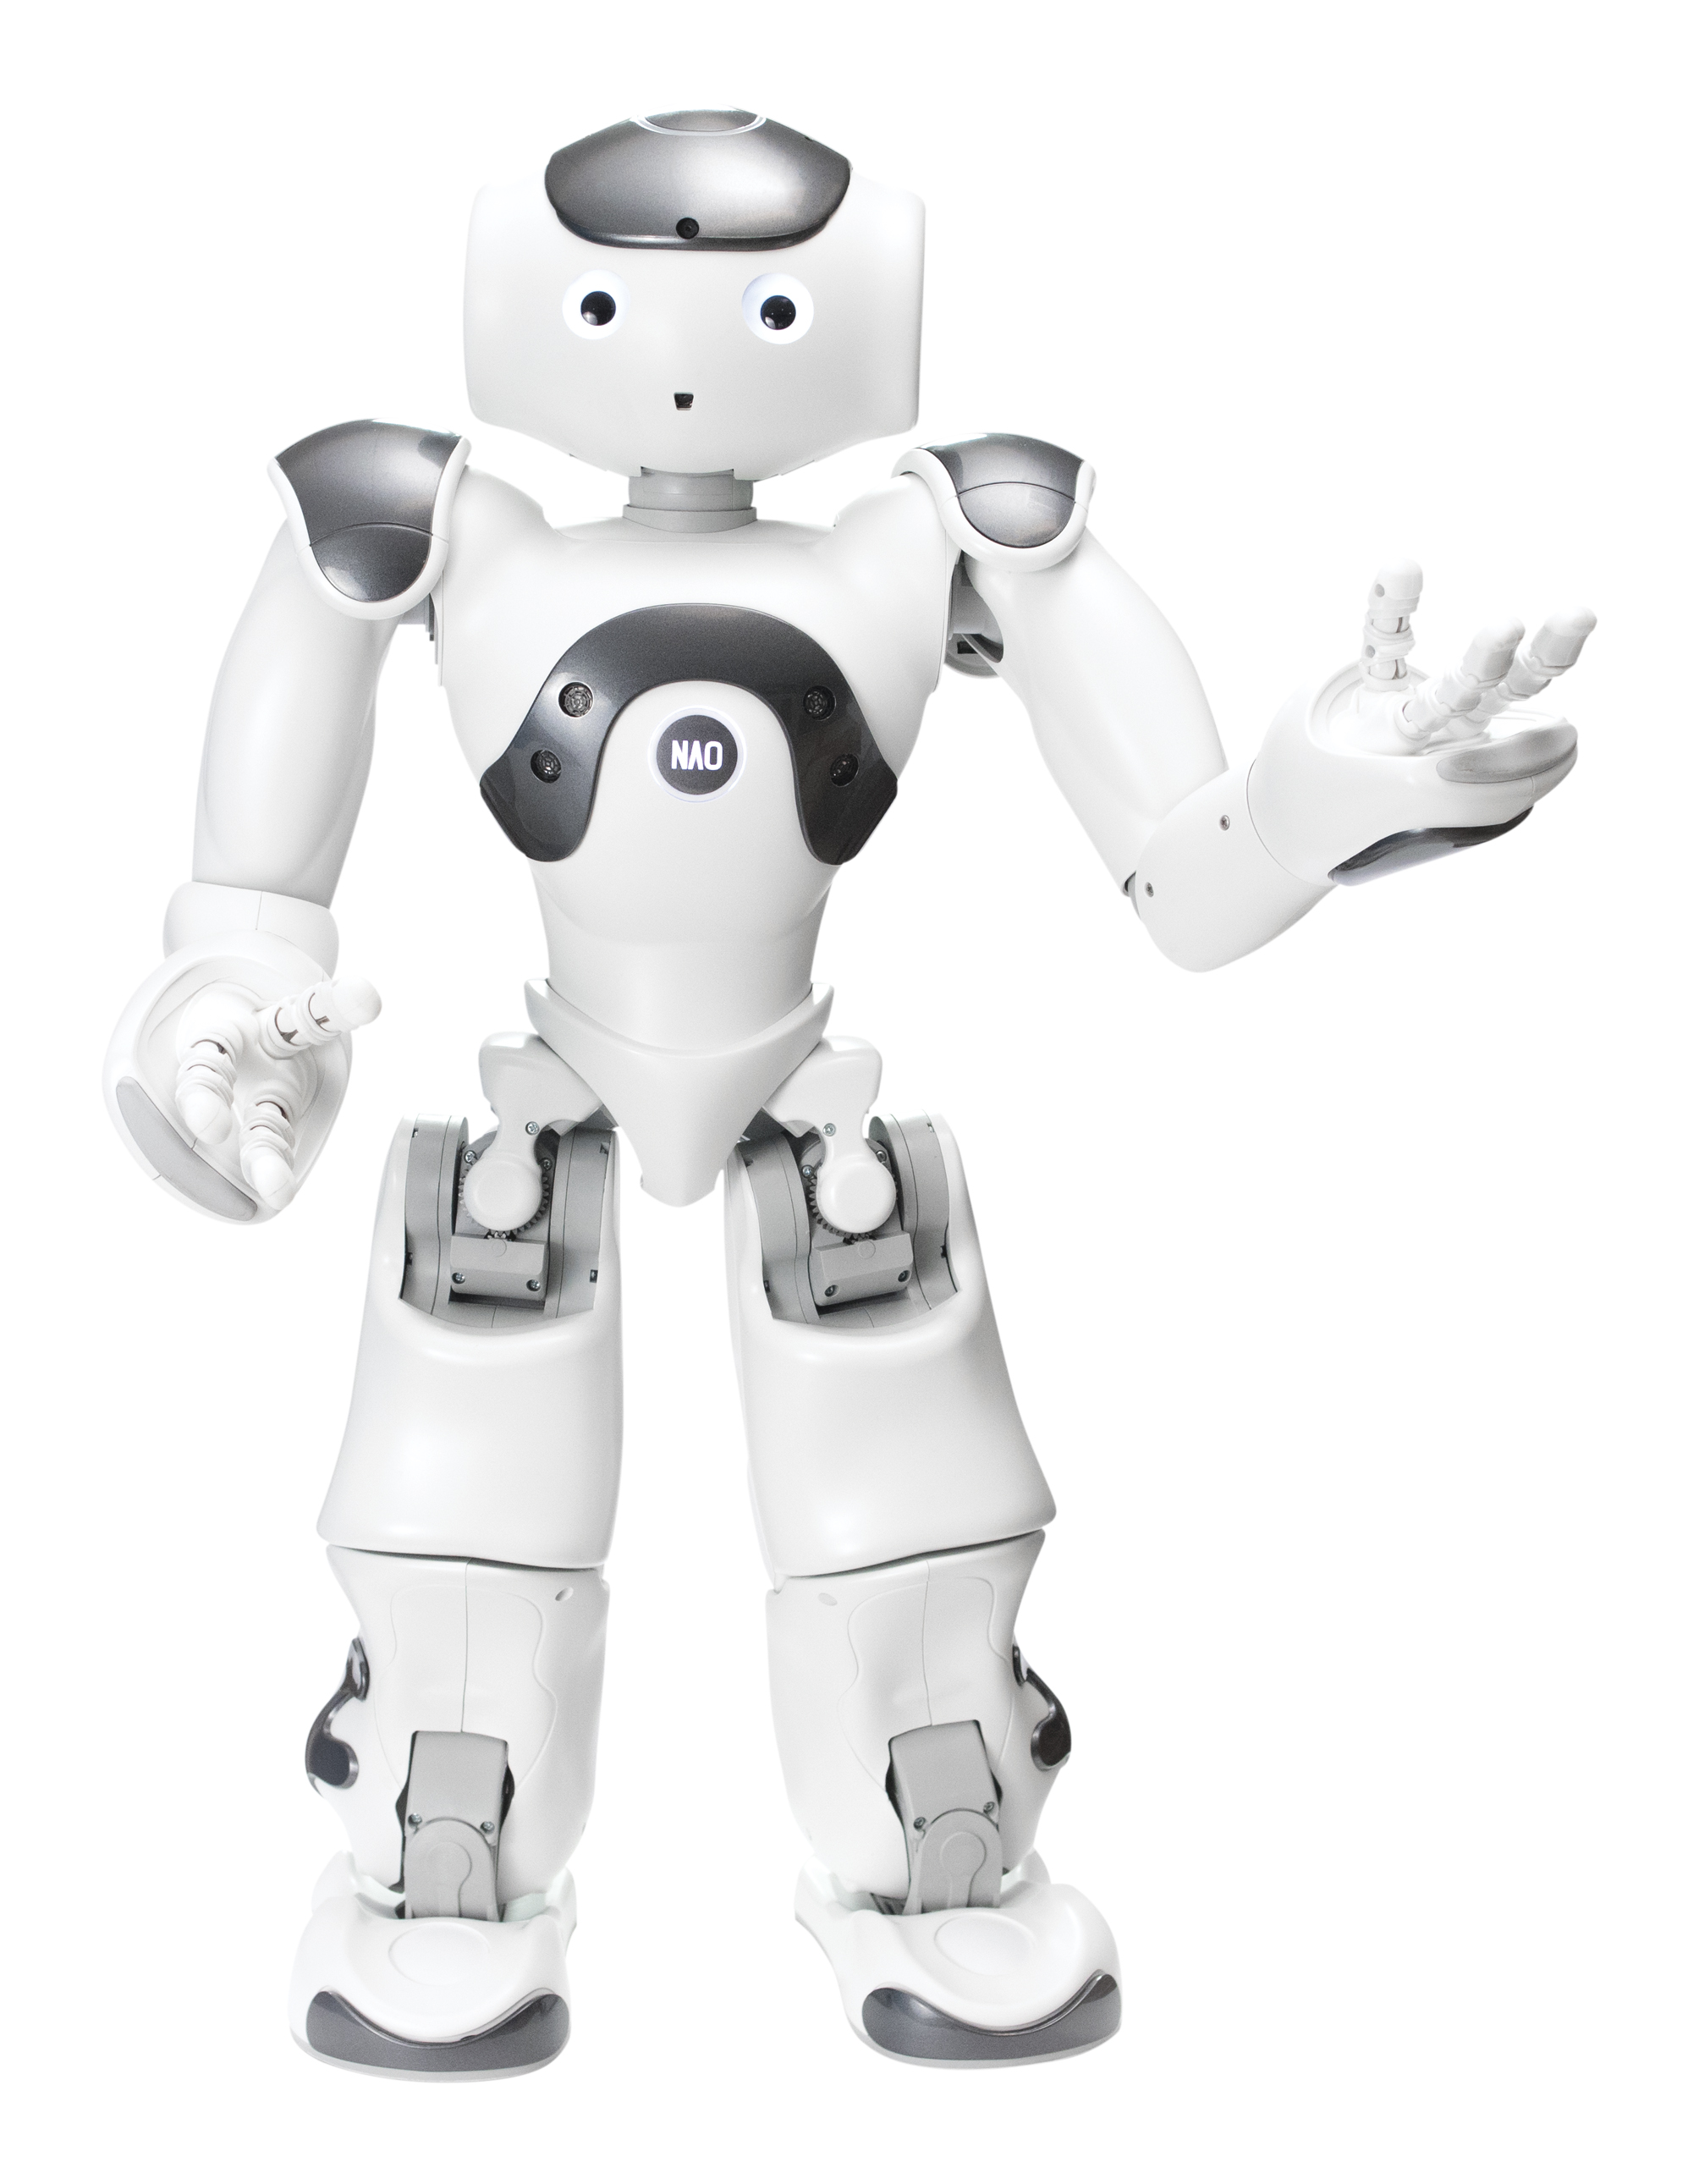 Erm Nao Humanoid Robot